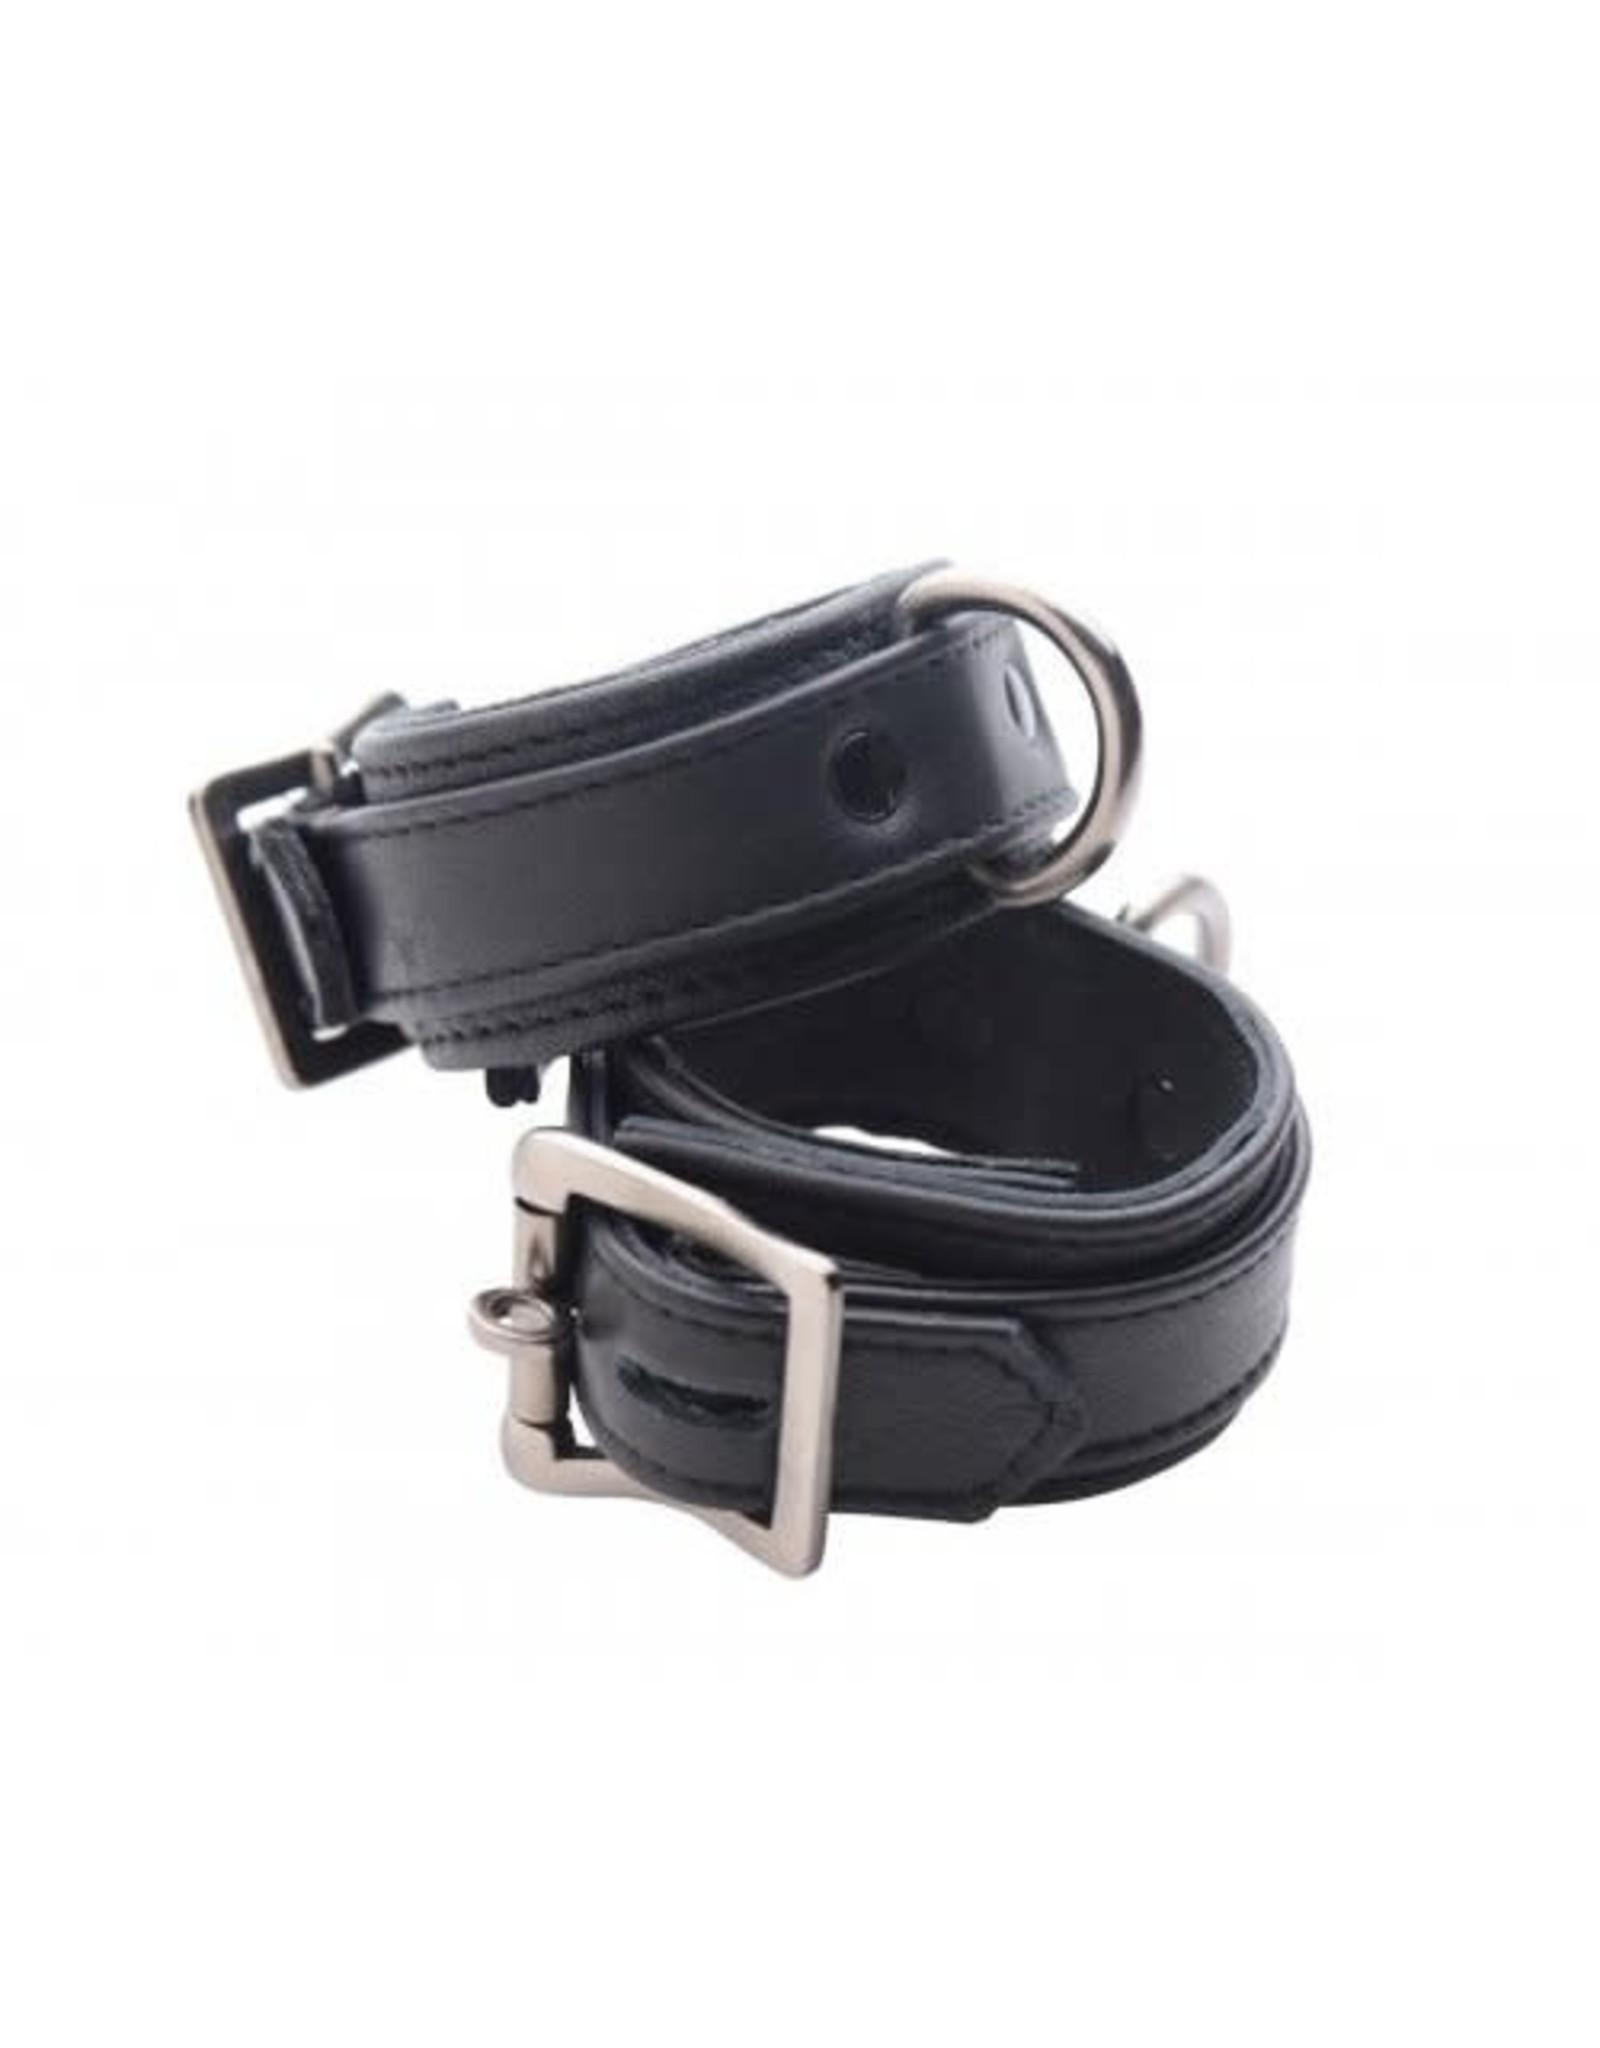 Strict Leather Strict Leather Luxury Locking Wrist Cuffs